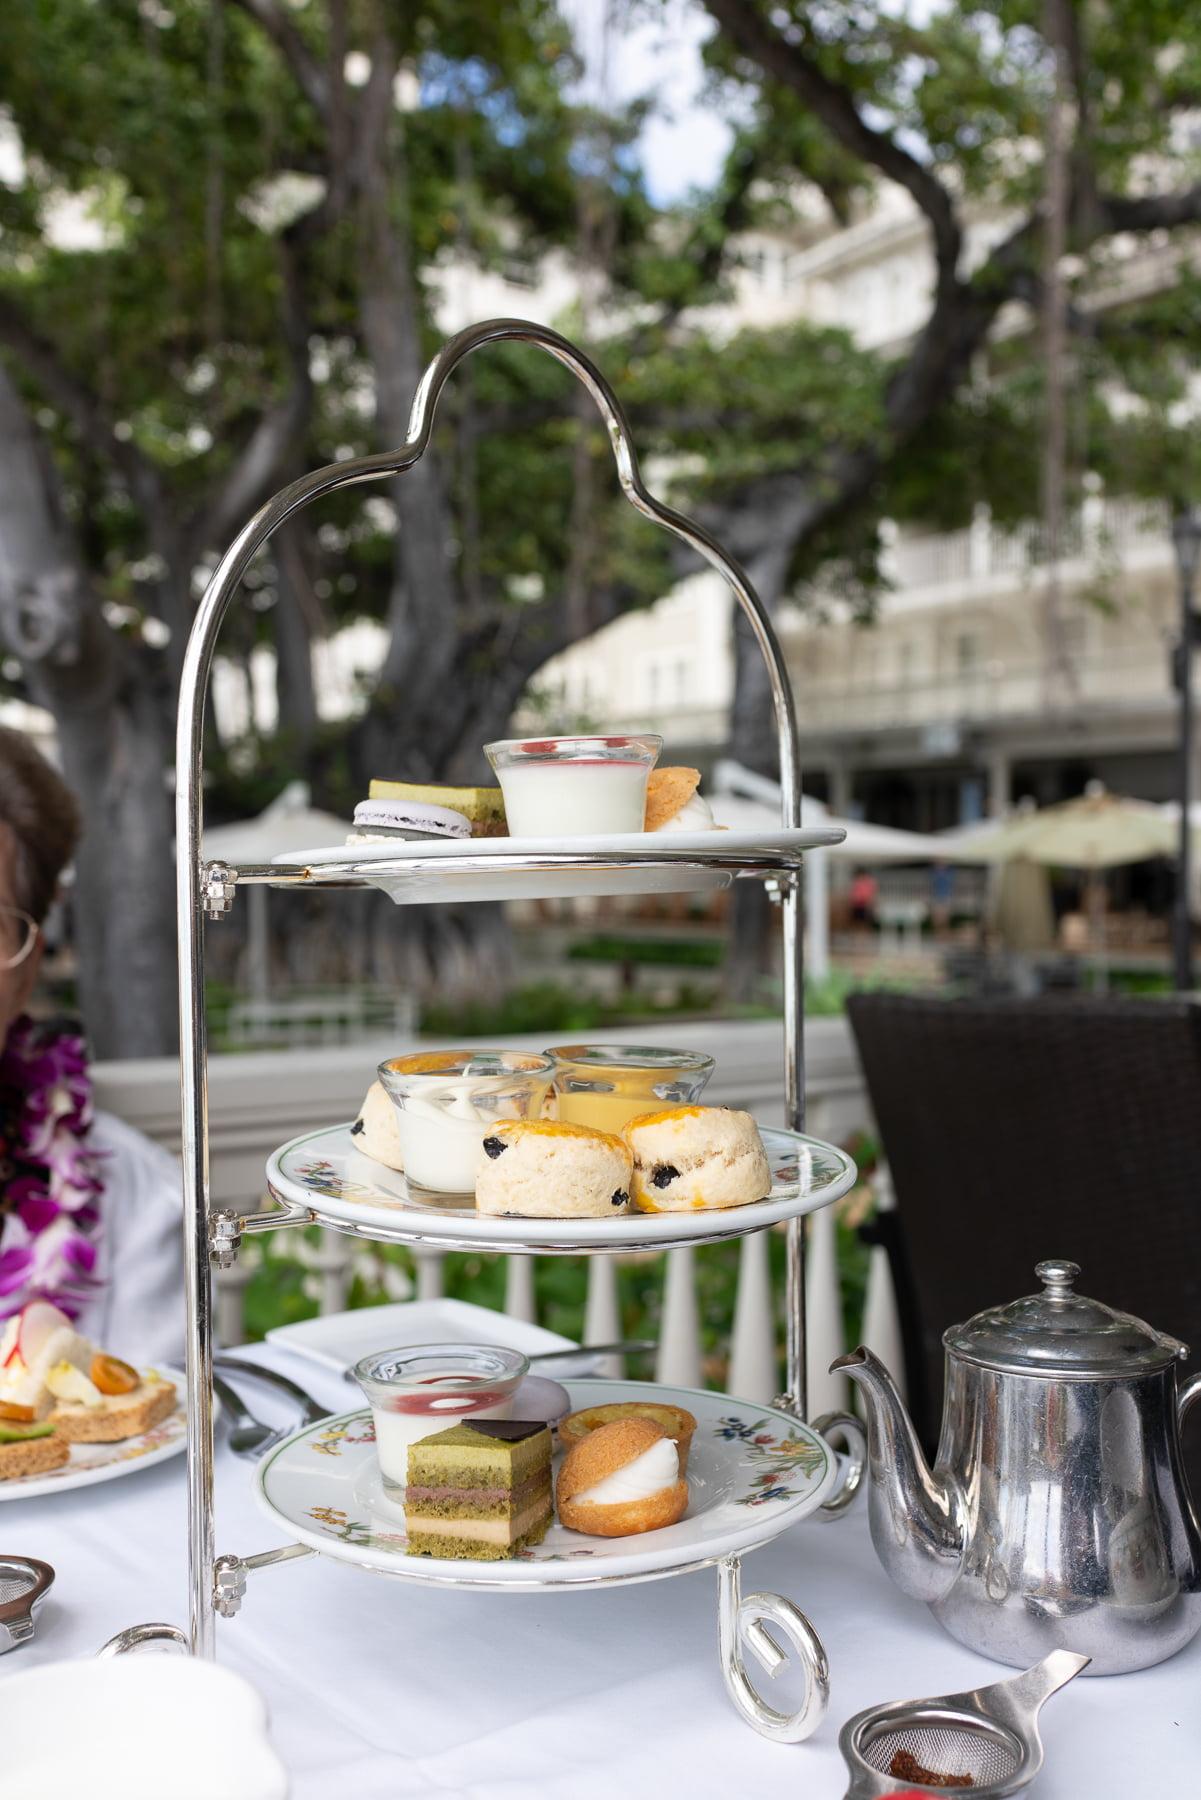 Afternoon tea set at Moana Surfrider